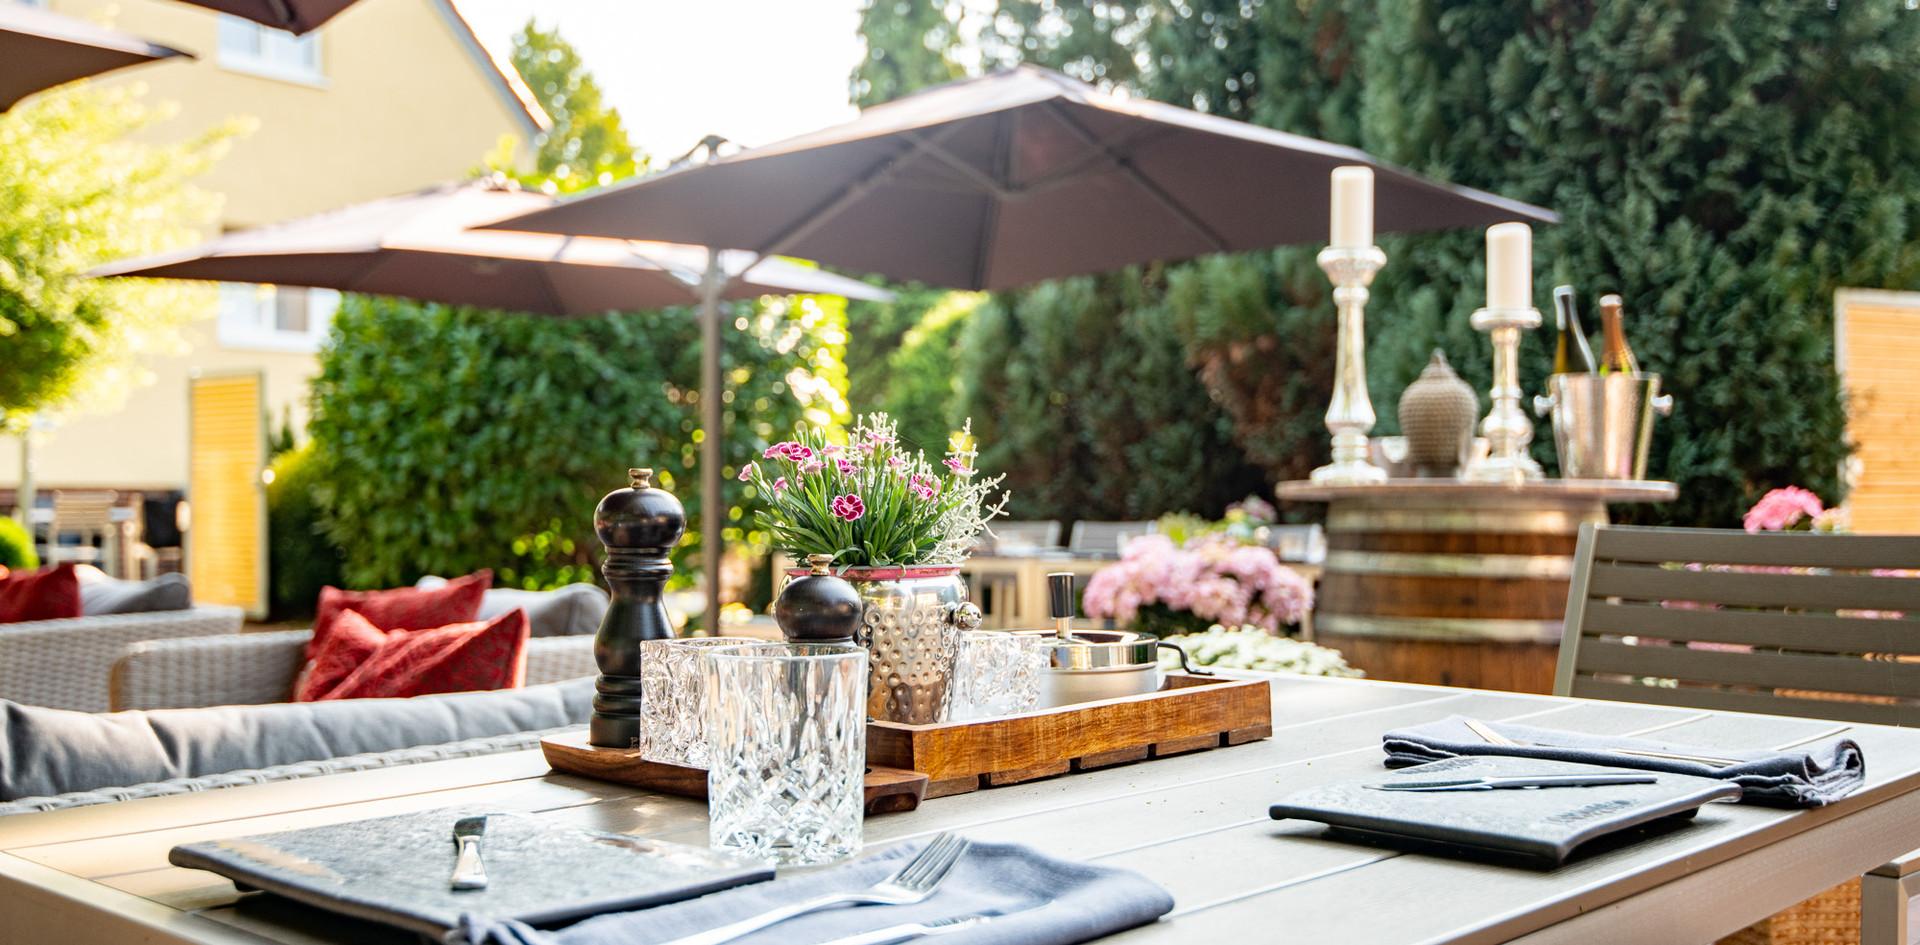 Feiern Gartenterrasse Hotel Wegner - the culinary art hotel